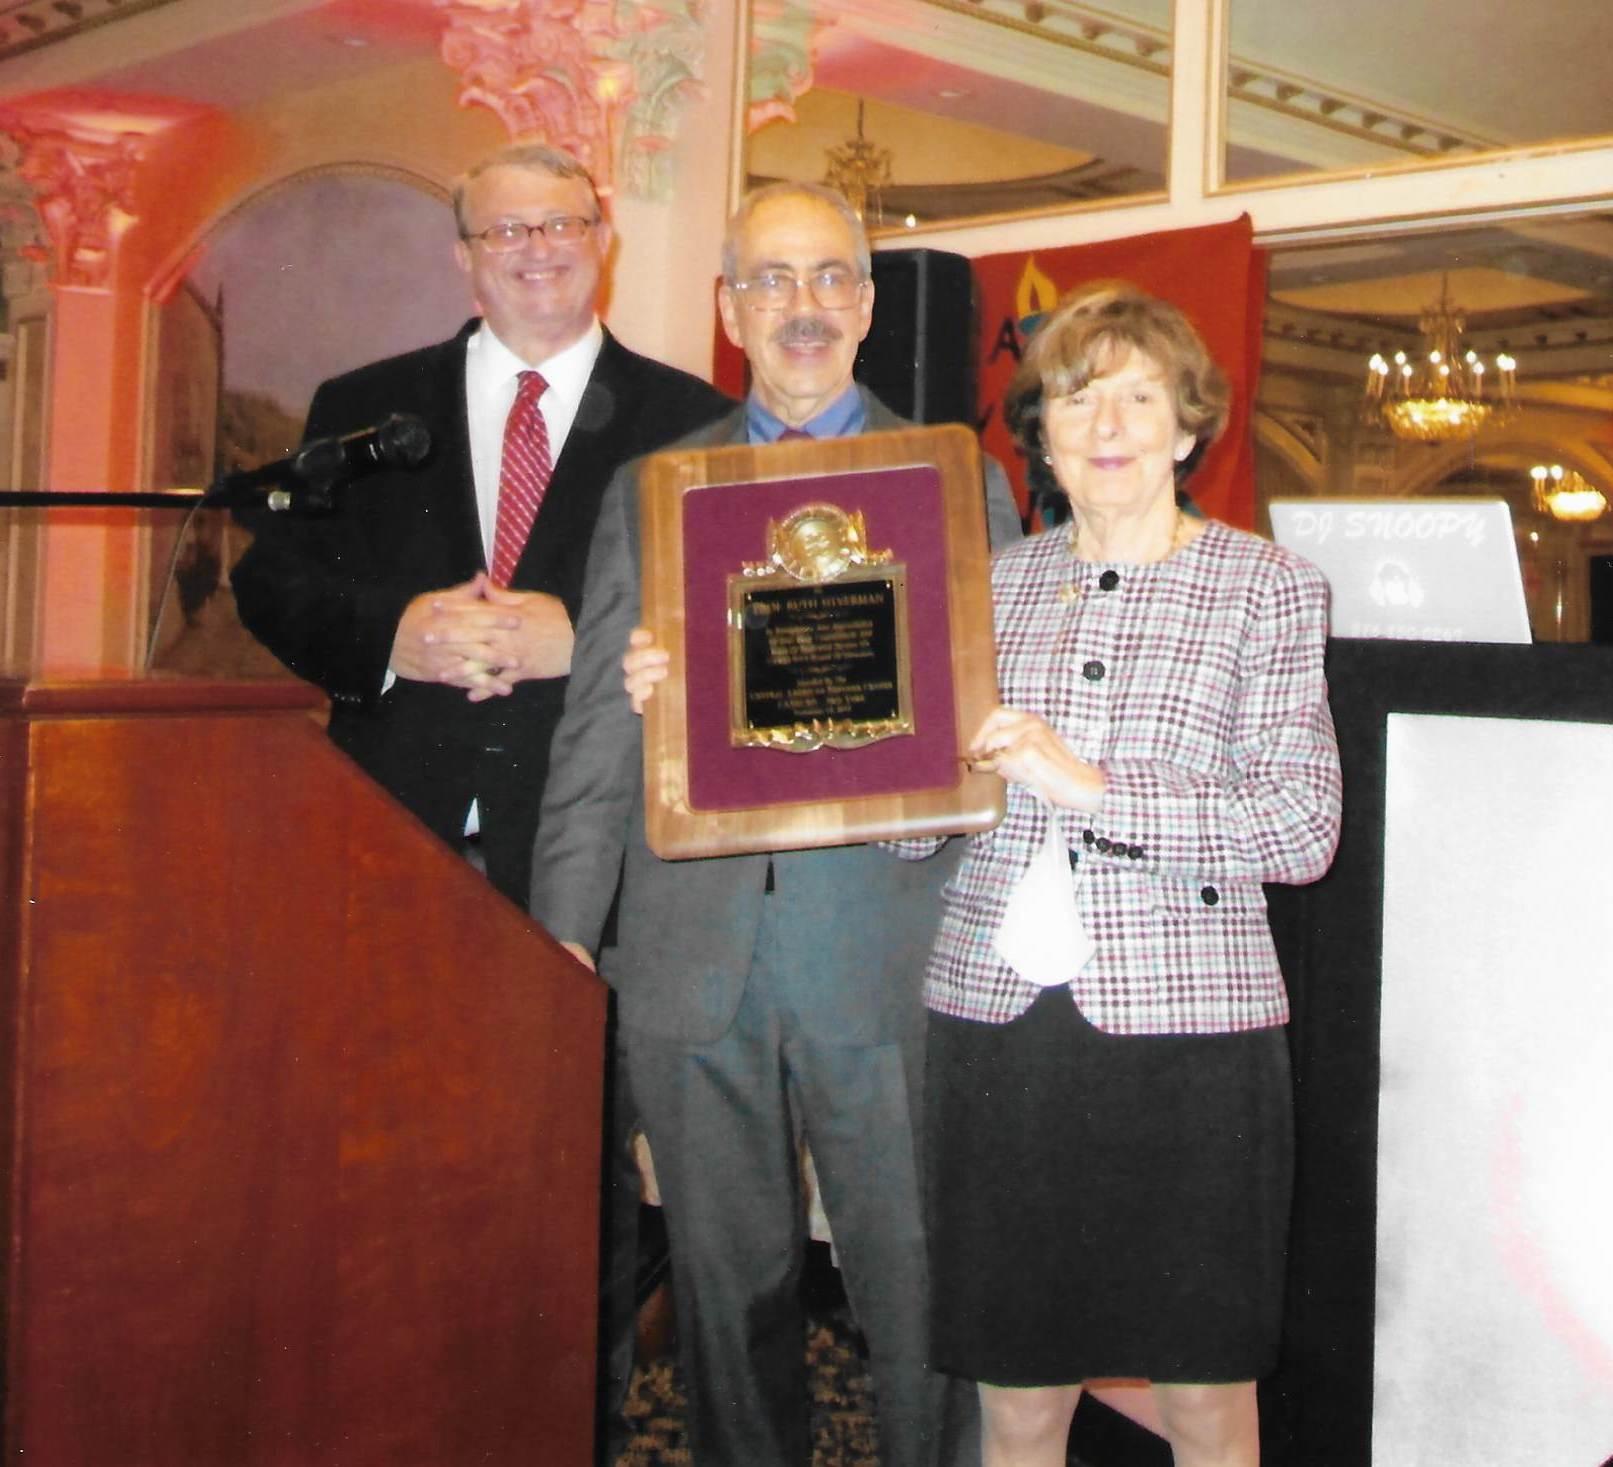 2015 CARECEN Gala Honoree Ruth Silverman